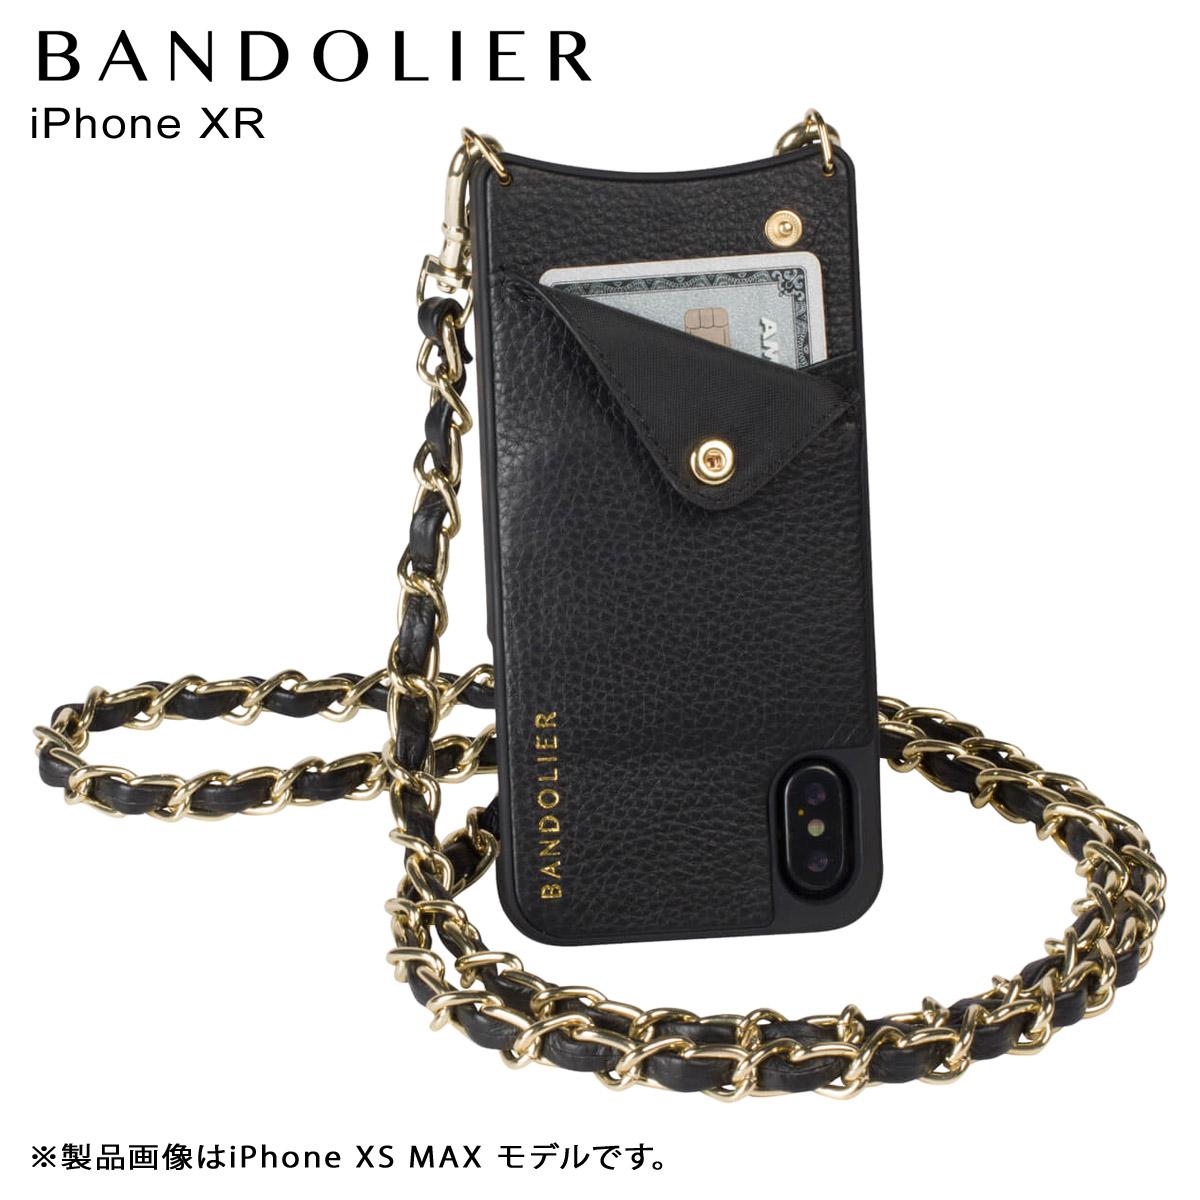 BANDOLIER iPhone XR LUCY GOLD バンドリヤー ケース ショルダー スマホ アイフォン レザー メンズ レディース ブラック 10LCY1001 [予約商品 4月下旬頃入荷予定 再入荷]